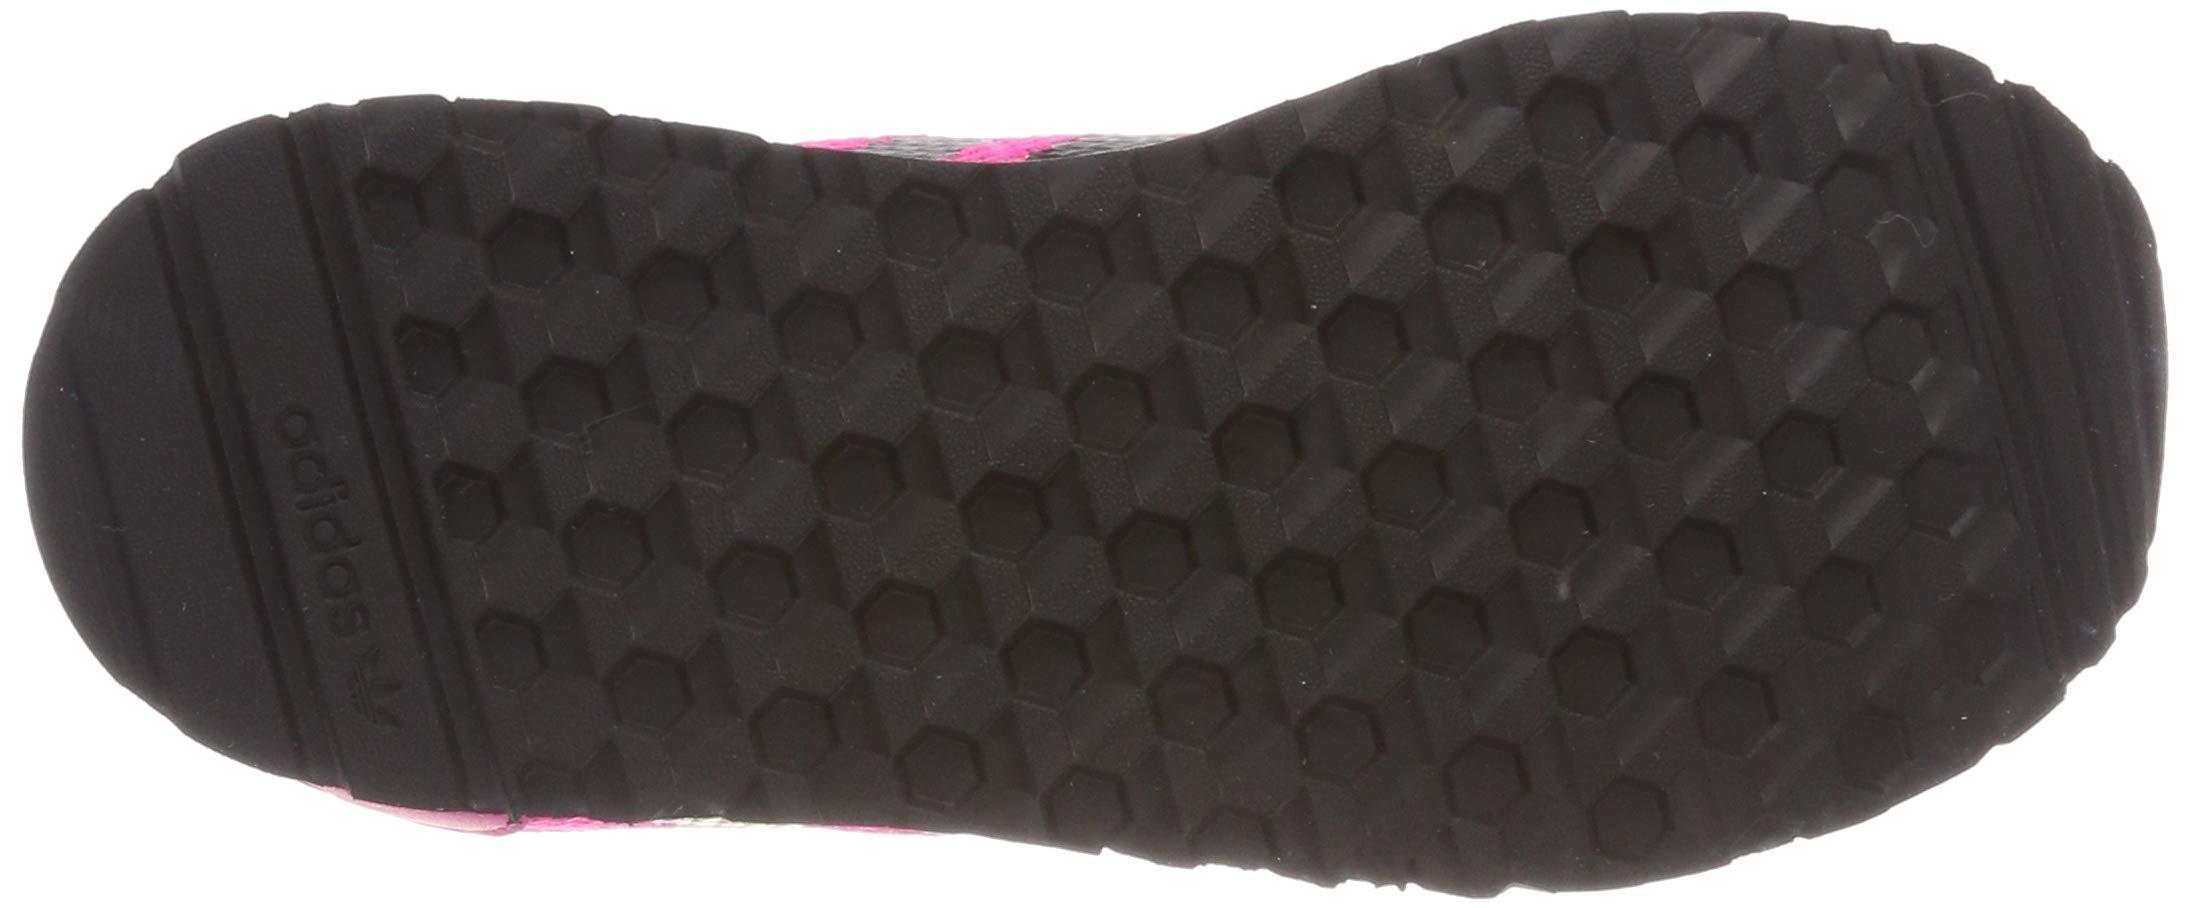 adidas N-5923 El I Scarpe da Fitness Unisex – Bambini 3 spesavip